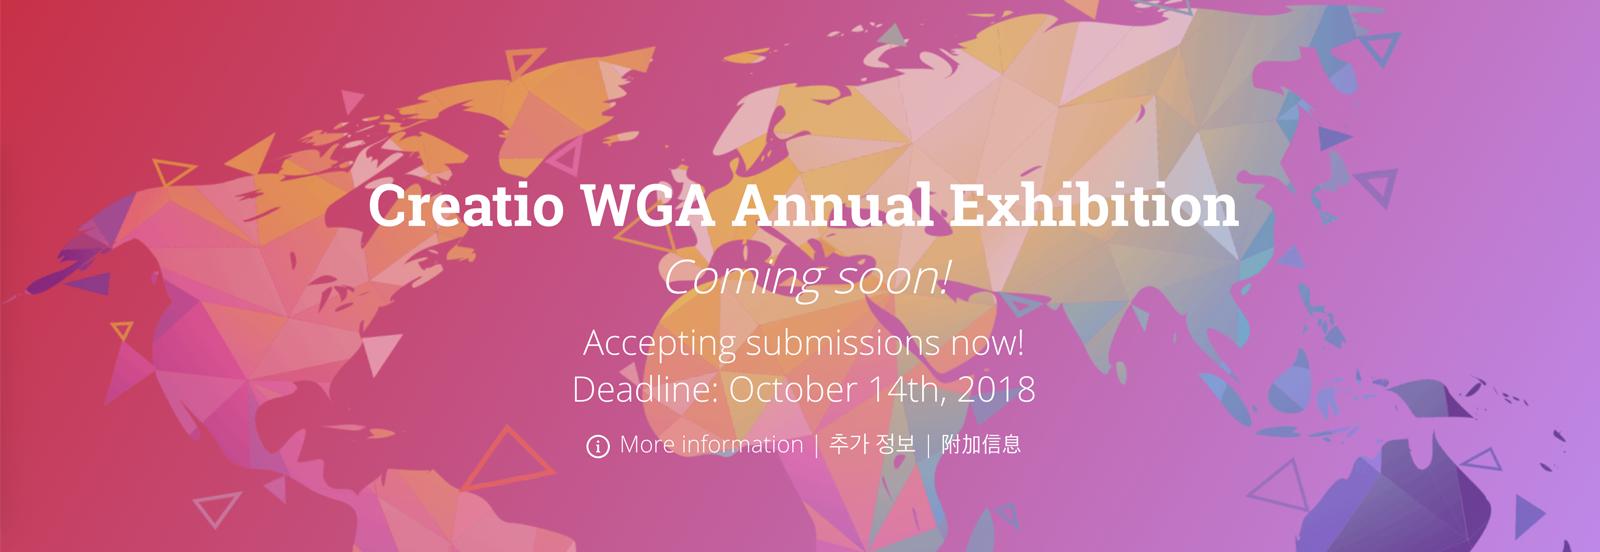 Creatio WGA Annual Exhibition